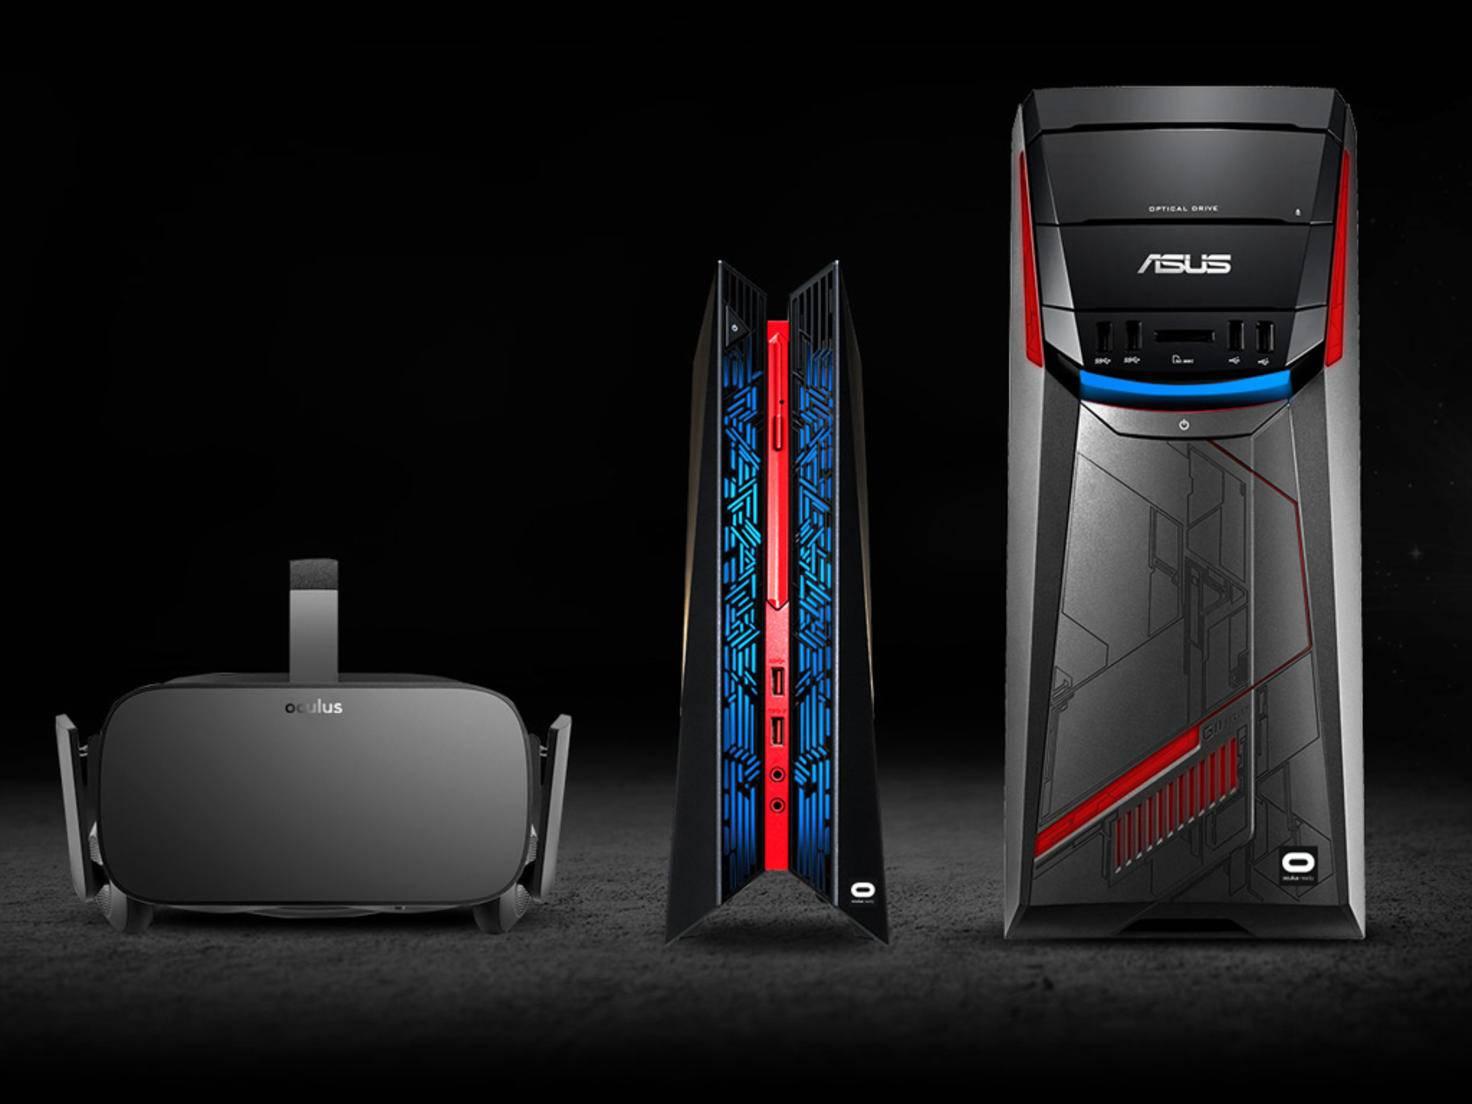 Asus_Oculus_ready